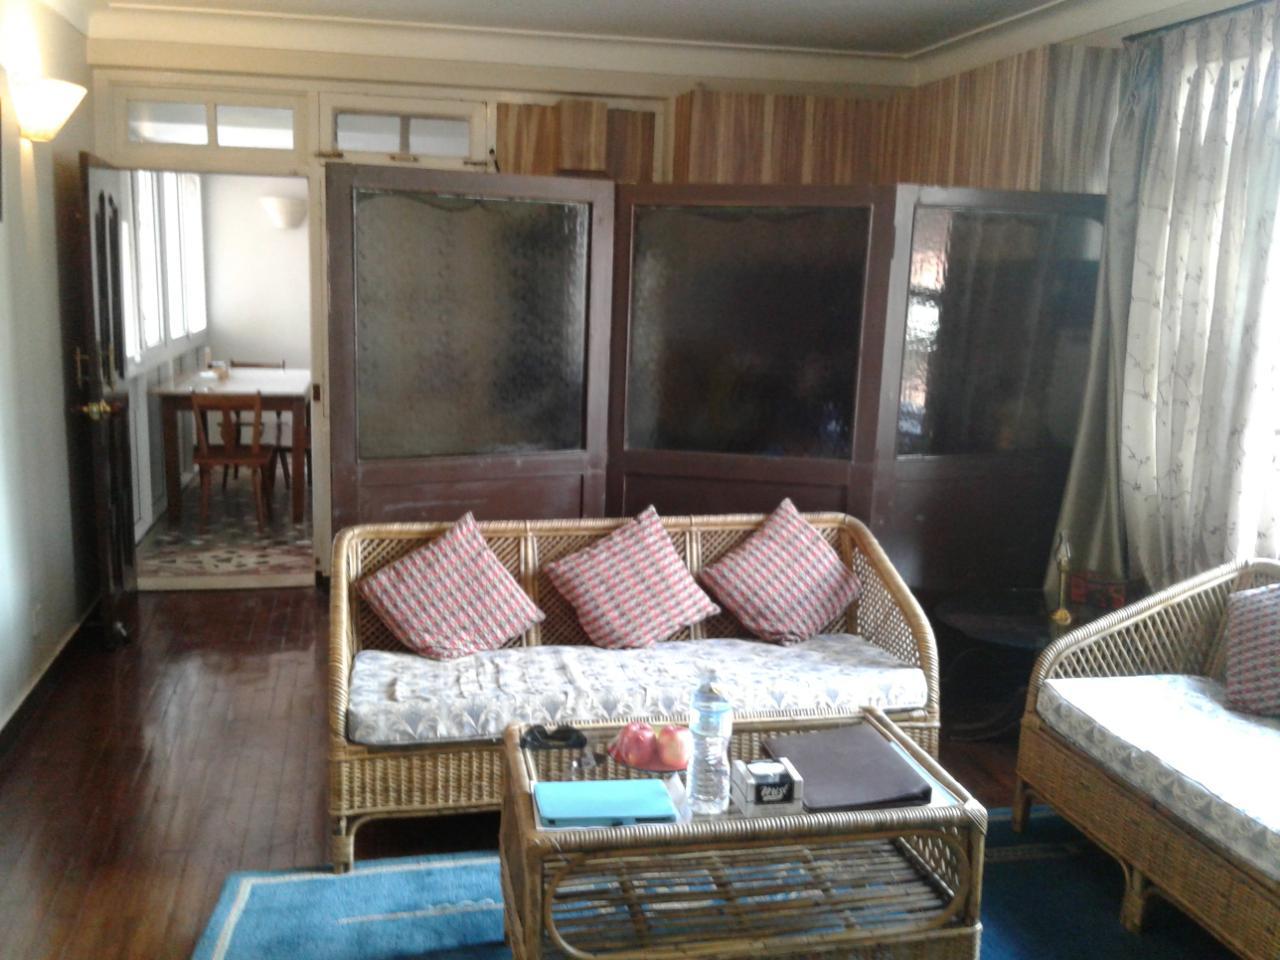 2018-09-20  Shaligram Hotel 07_1537462508610_1.JPG